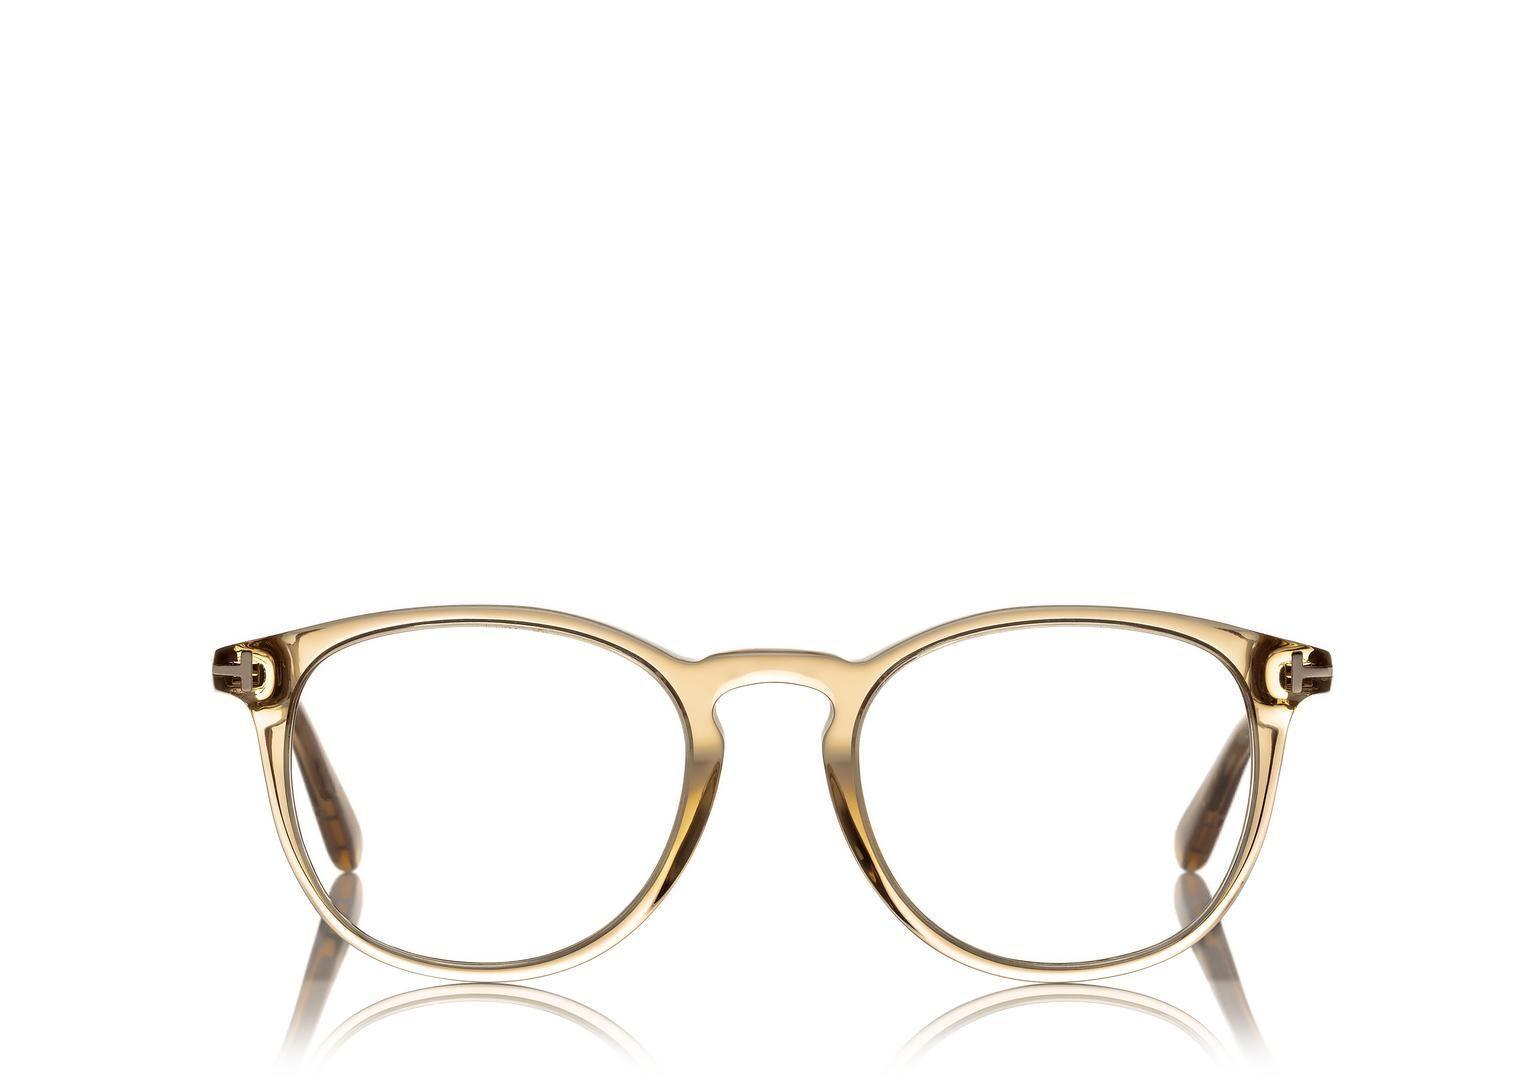 Soft round optical frame   Optical frames, Tom ford and Rounding